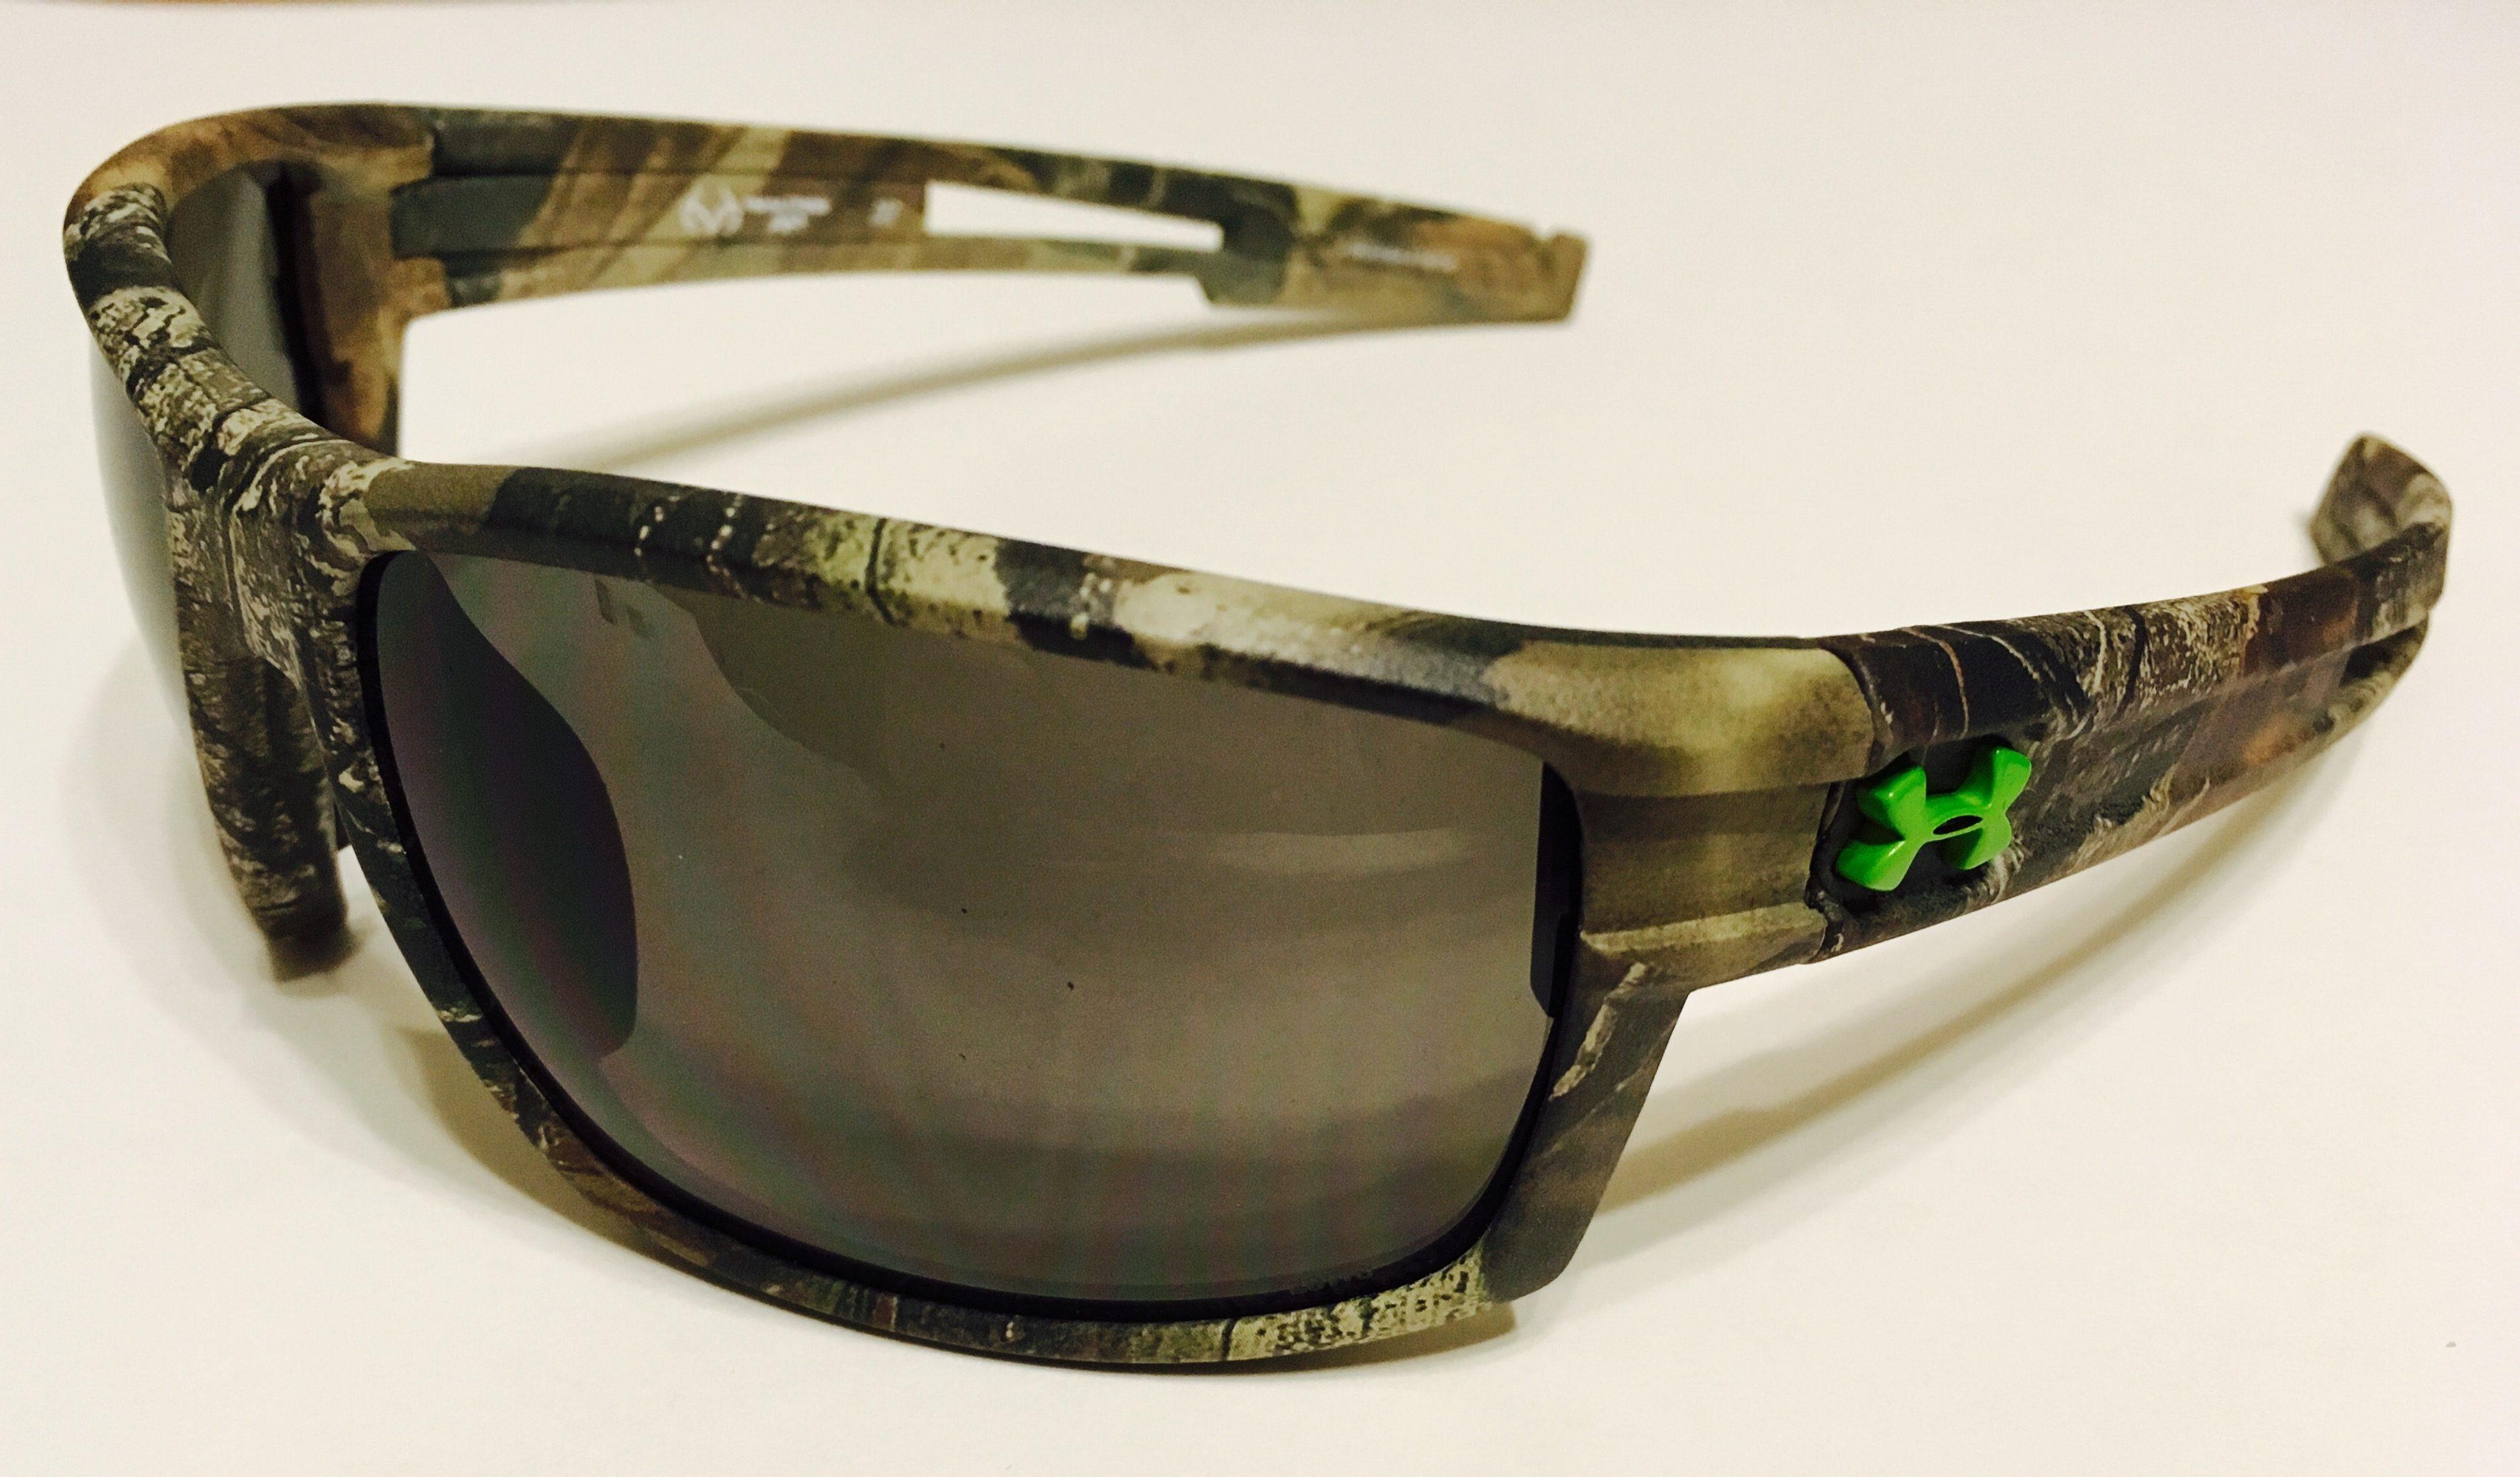 2118100012 Under Armour Realtree Sunglasses